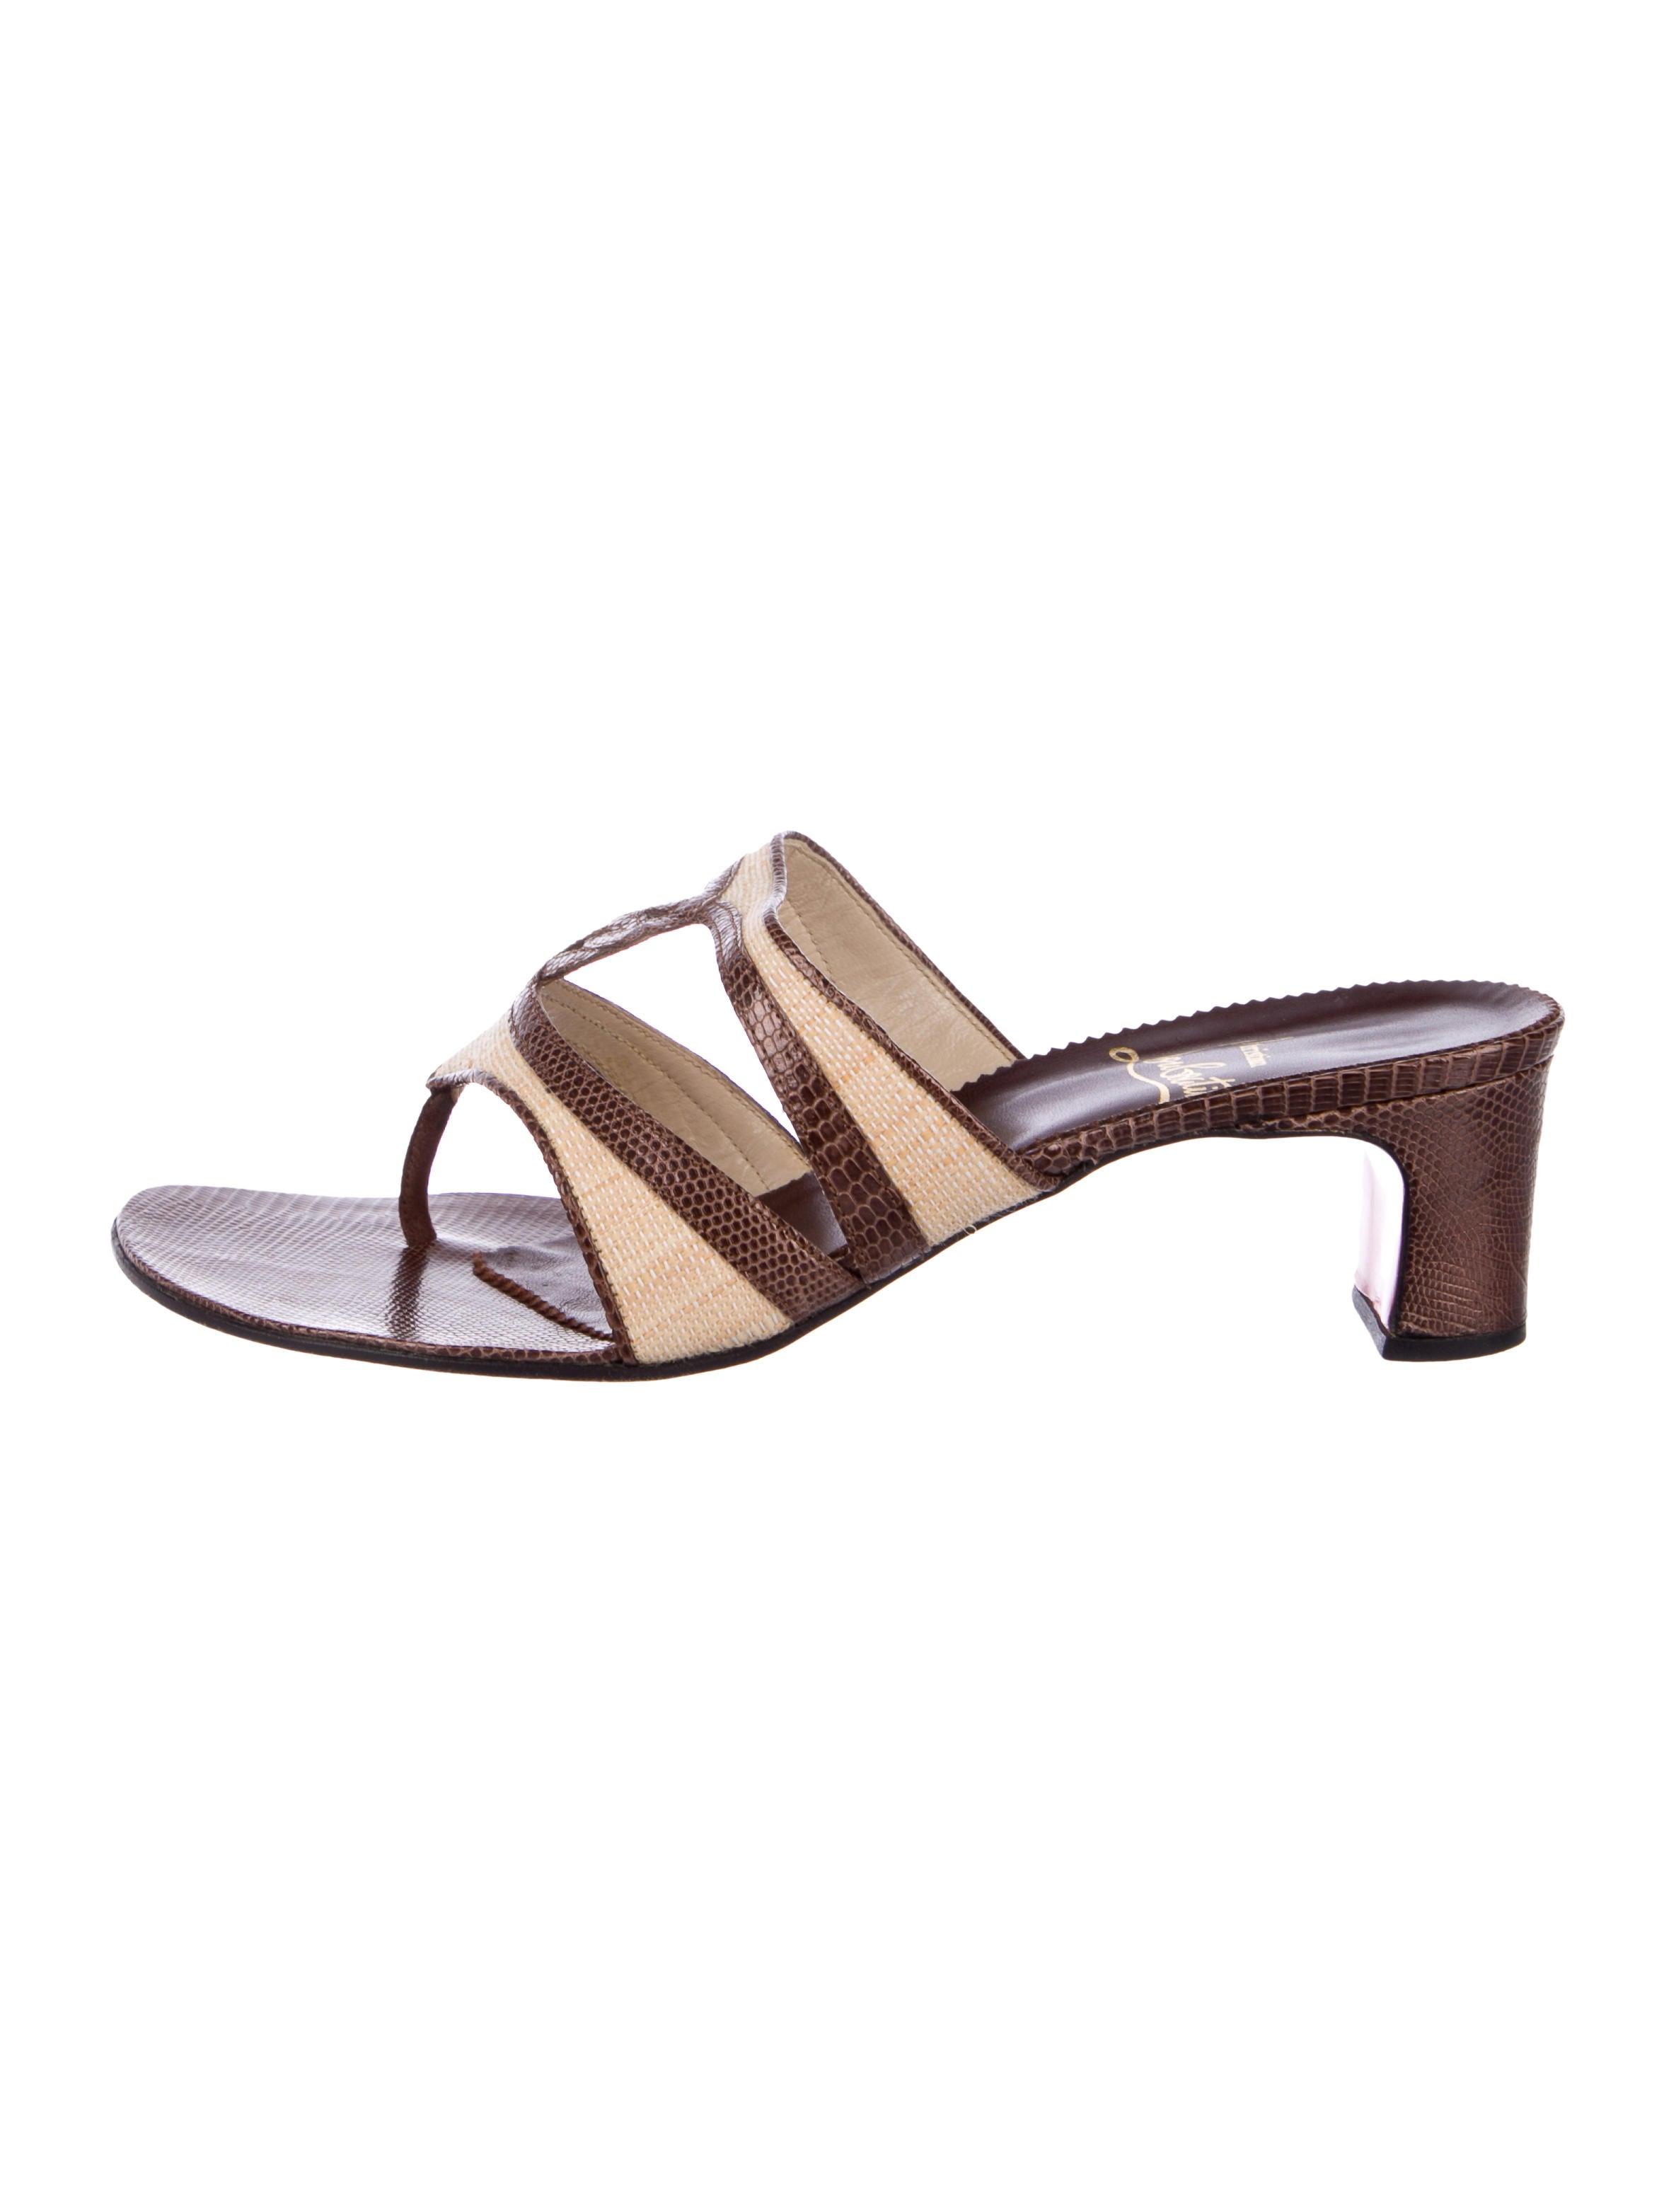 Shoes Christian Louboutin Cht111384the Lizard Nwn0opk8x Sandals Thong 6Y7vbgyf